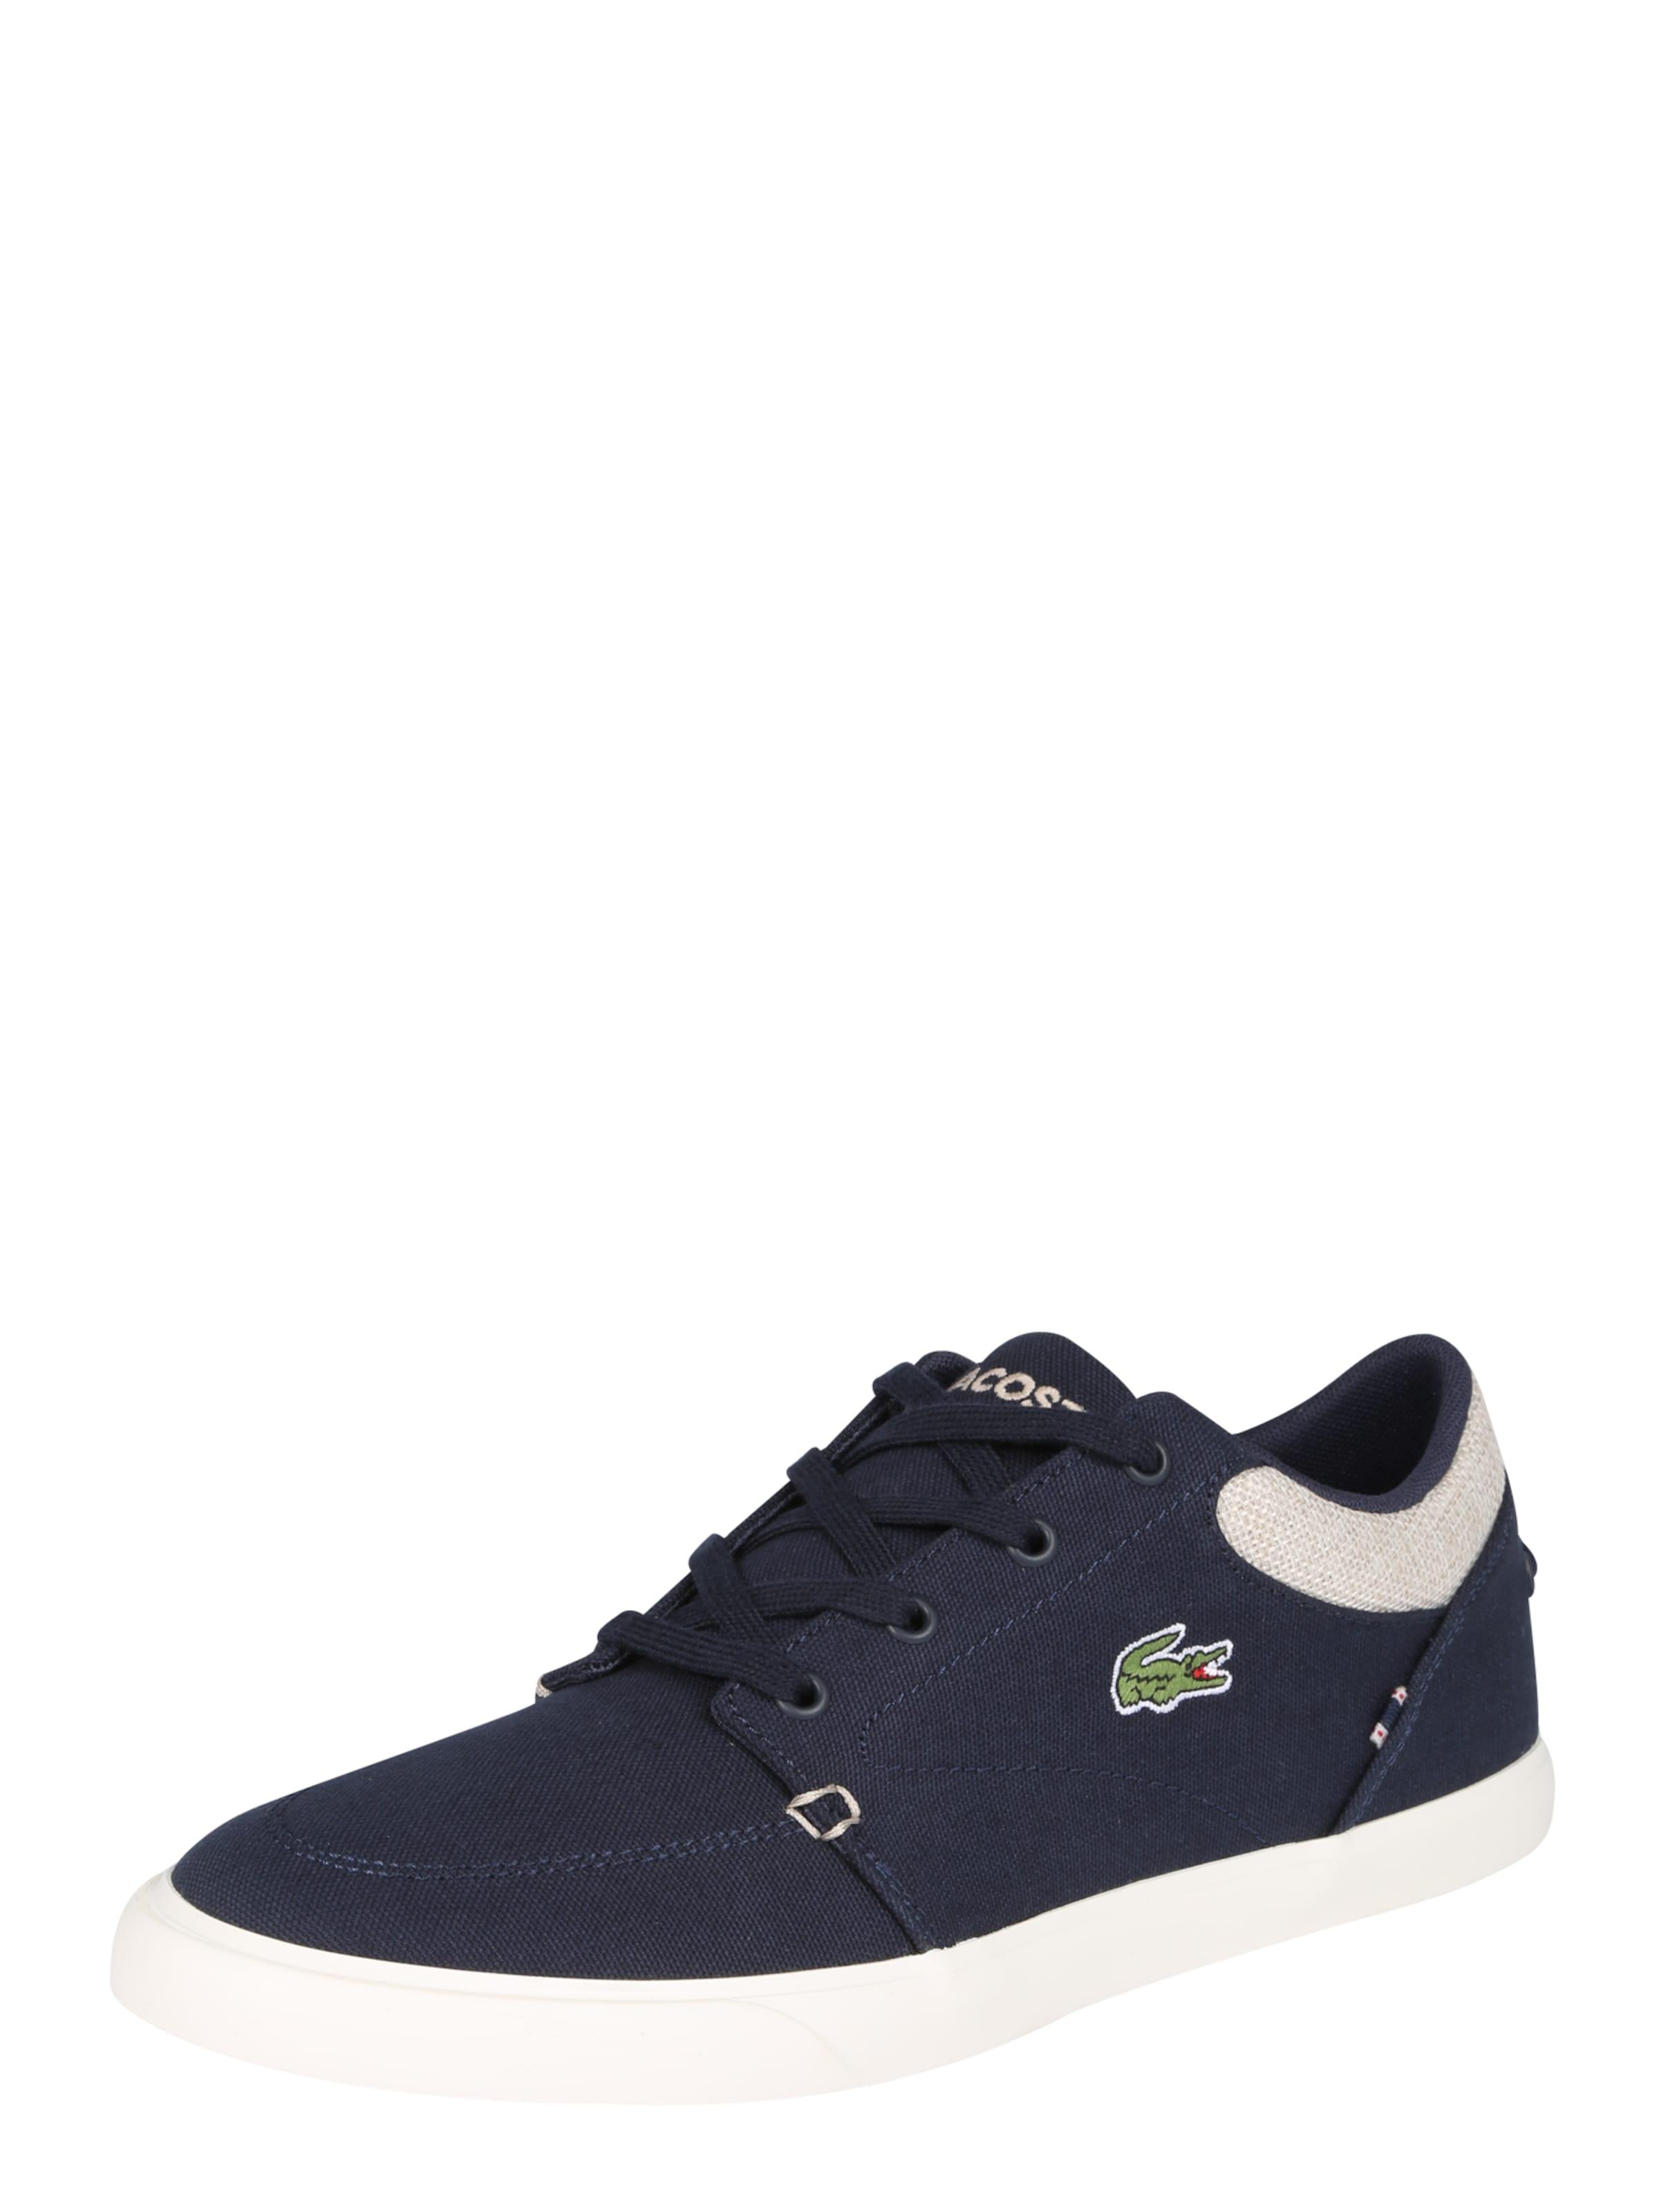 Haltbare Mode billige Schuhe LACOSTE | Sneaker 'BAYLISS' Schuhe Gut getragene Schuhe